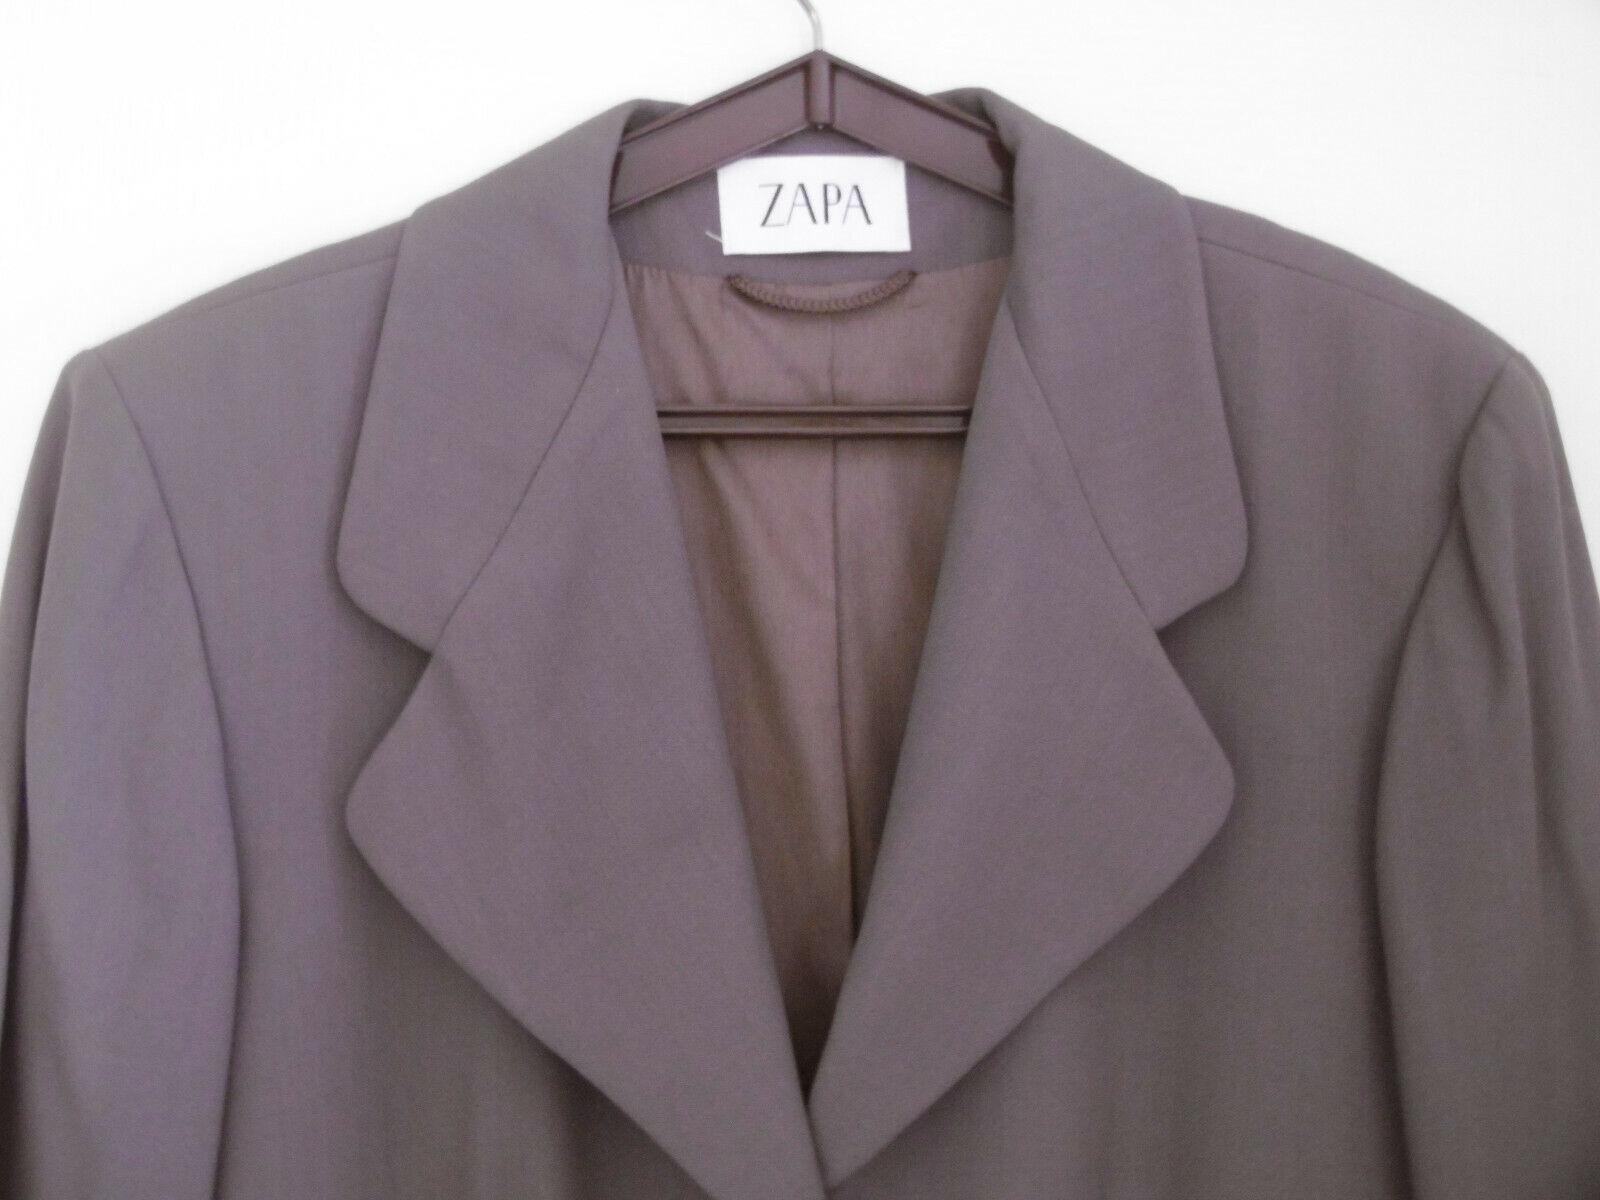 Veste / manteau zapa laine (85 %) taille 46 beige soutenu impeccable